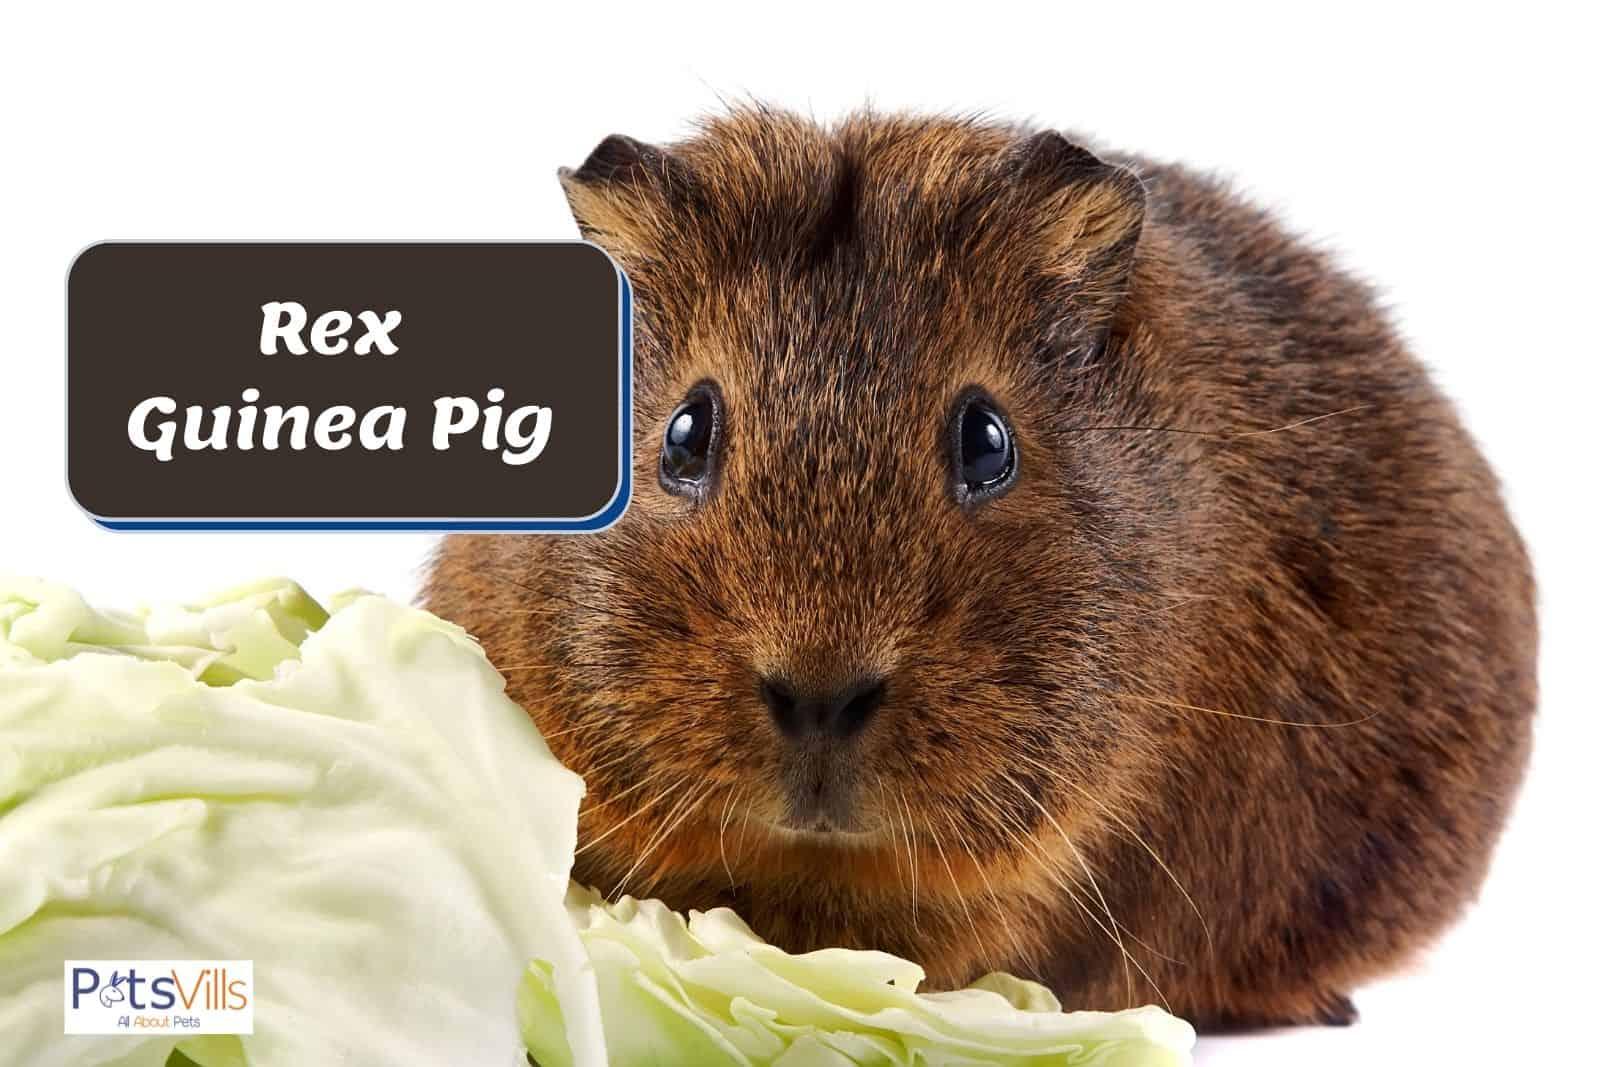 rex guinea pig beside a cabbage